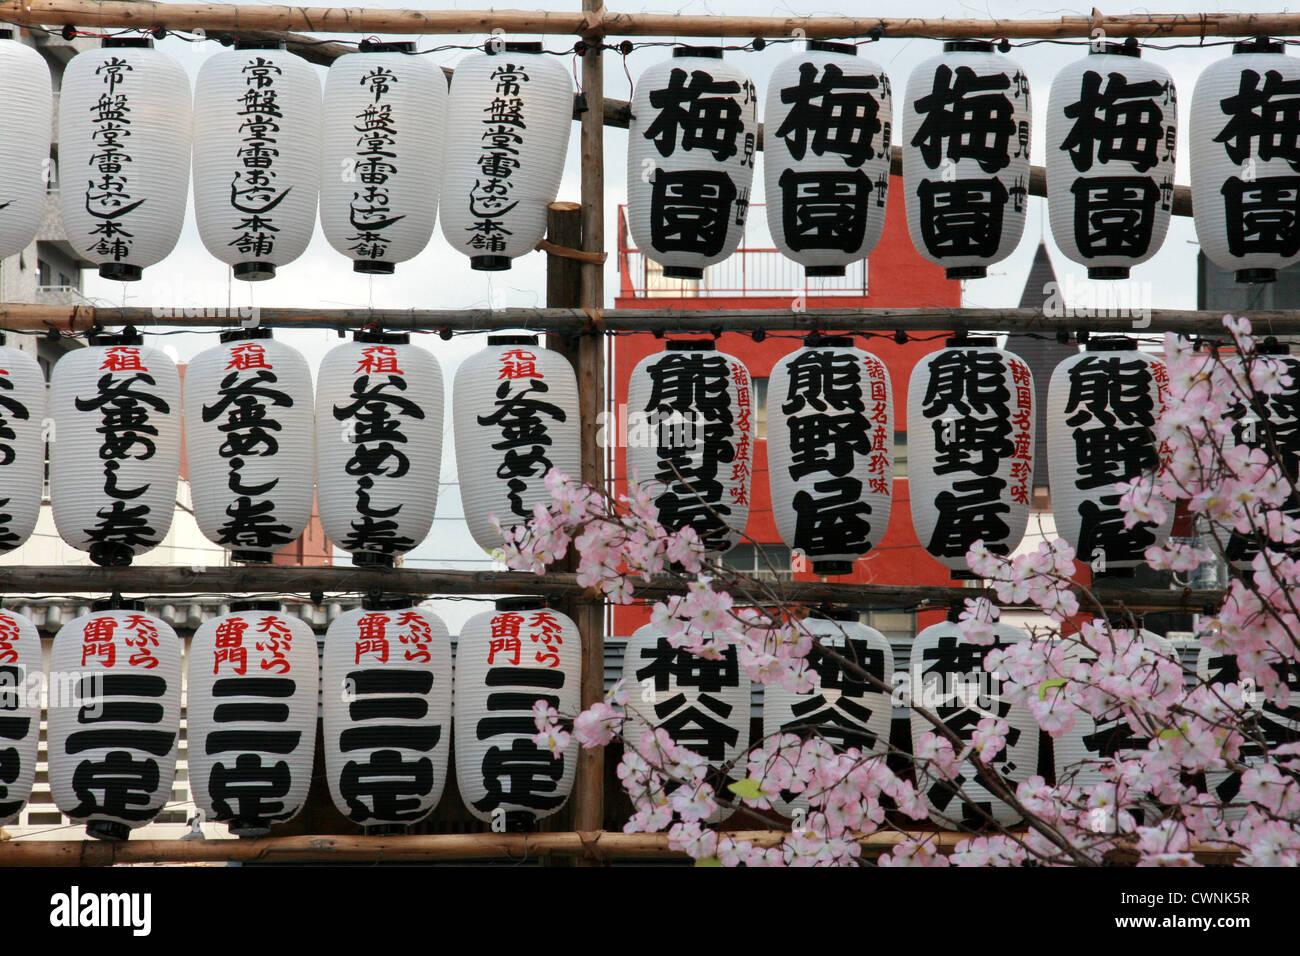 Japanese lanterns with cherry blossom in Asakusa, Tokyo, Japan - Stock Image